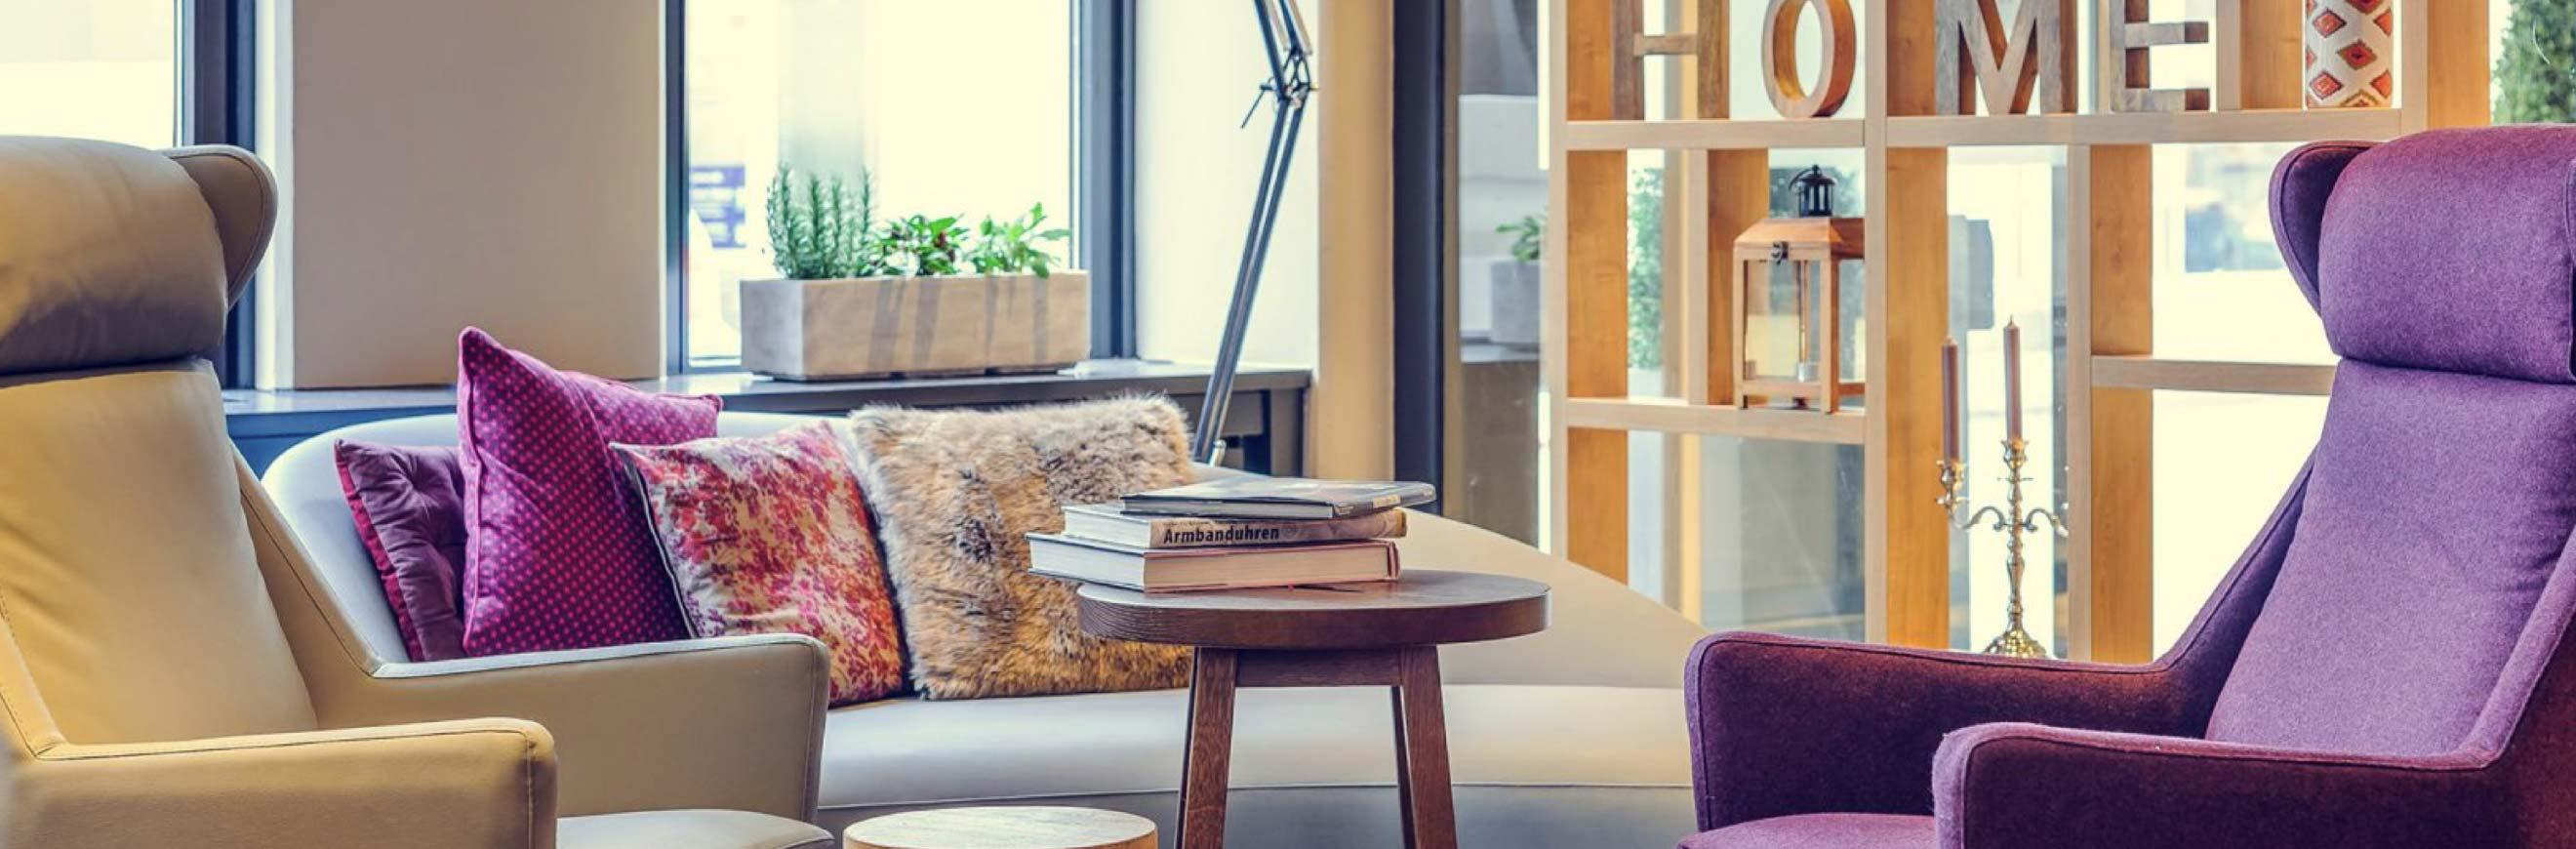 Mercure relax header für Baum & Garten Website